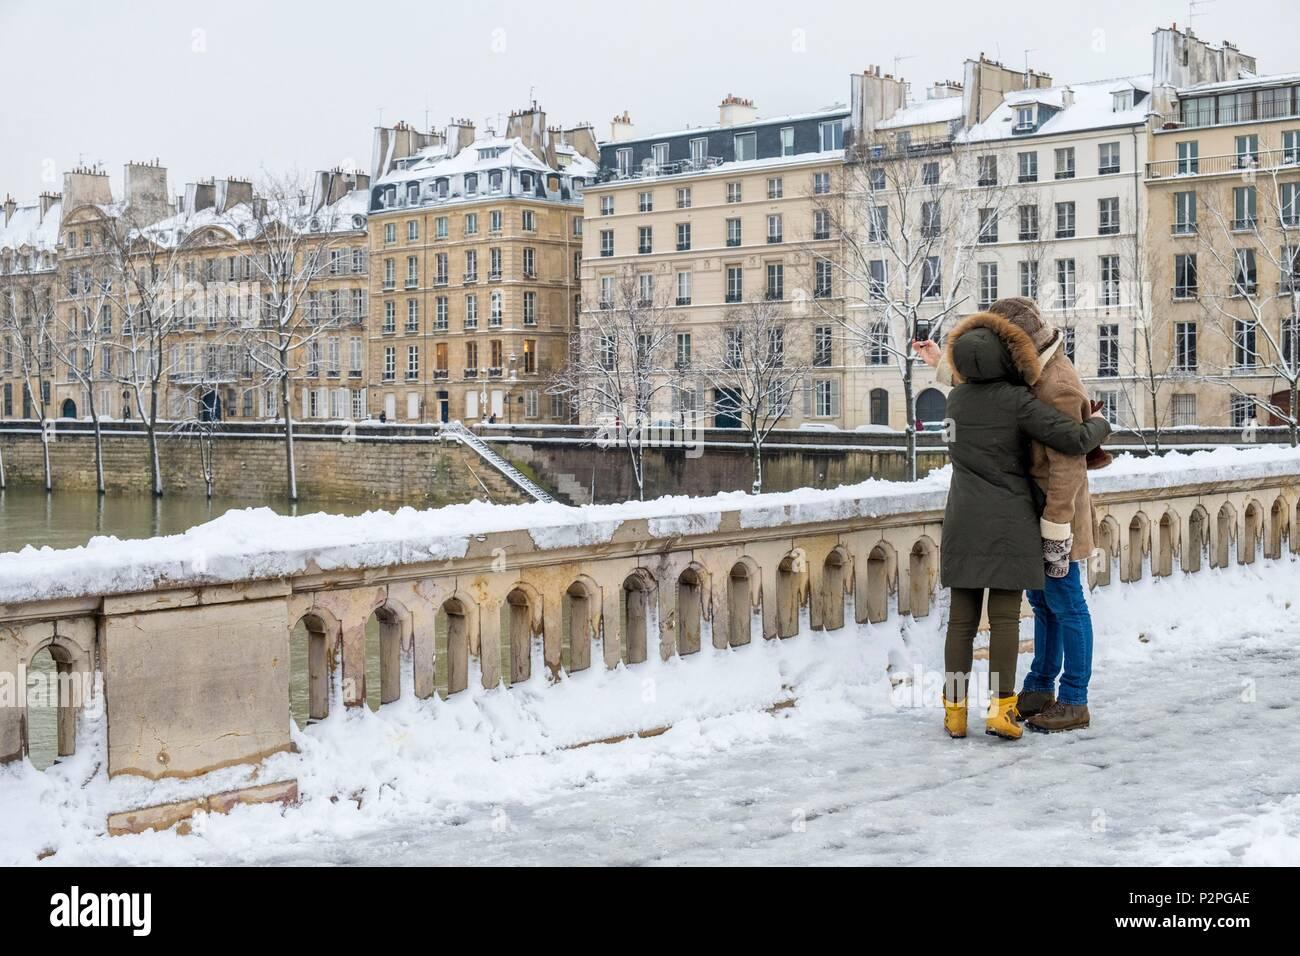 France, Paris, in love on the Louis Philippe bridge, snowfalls on 07/02/2018 - Stock Image